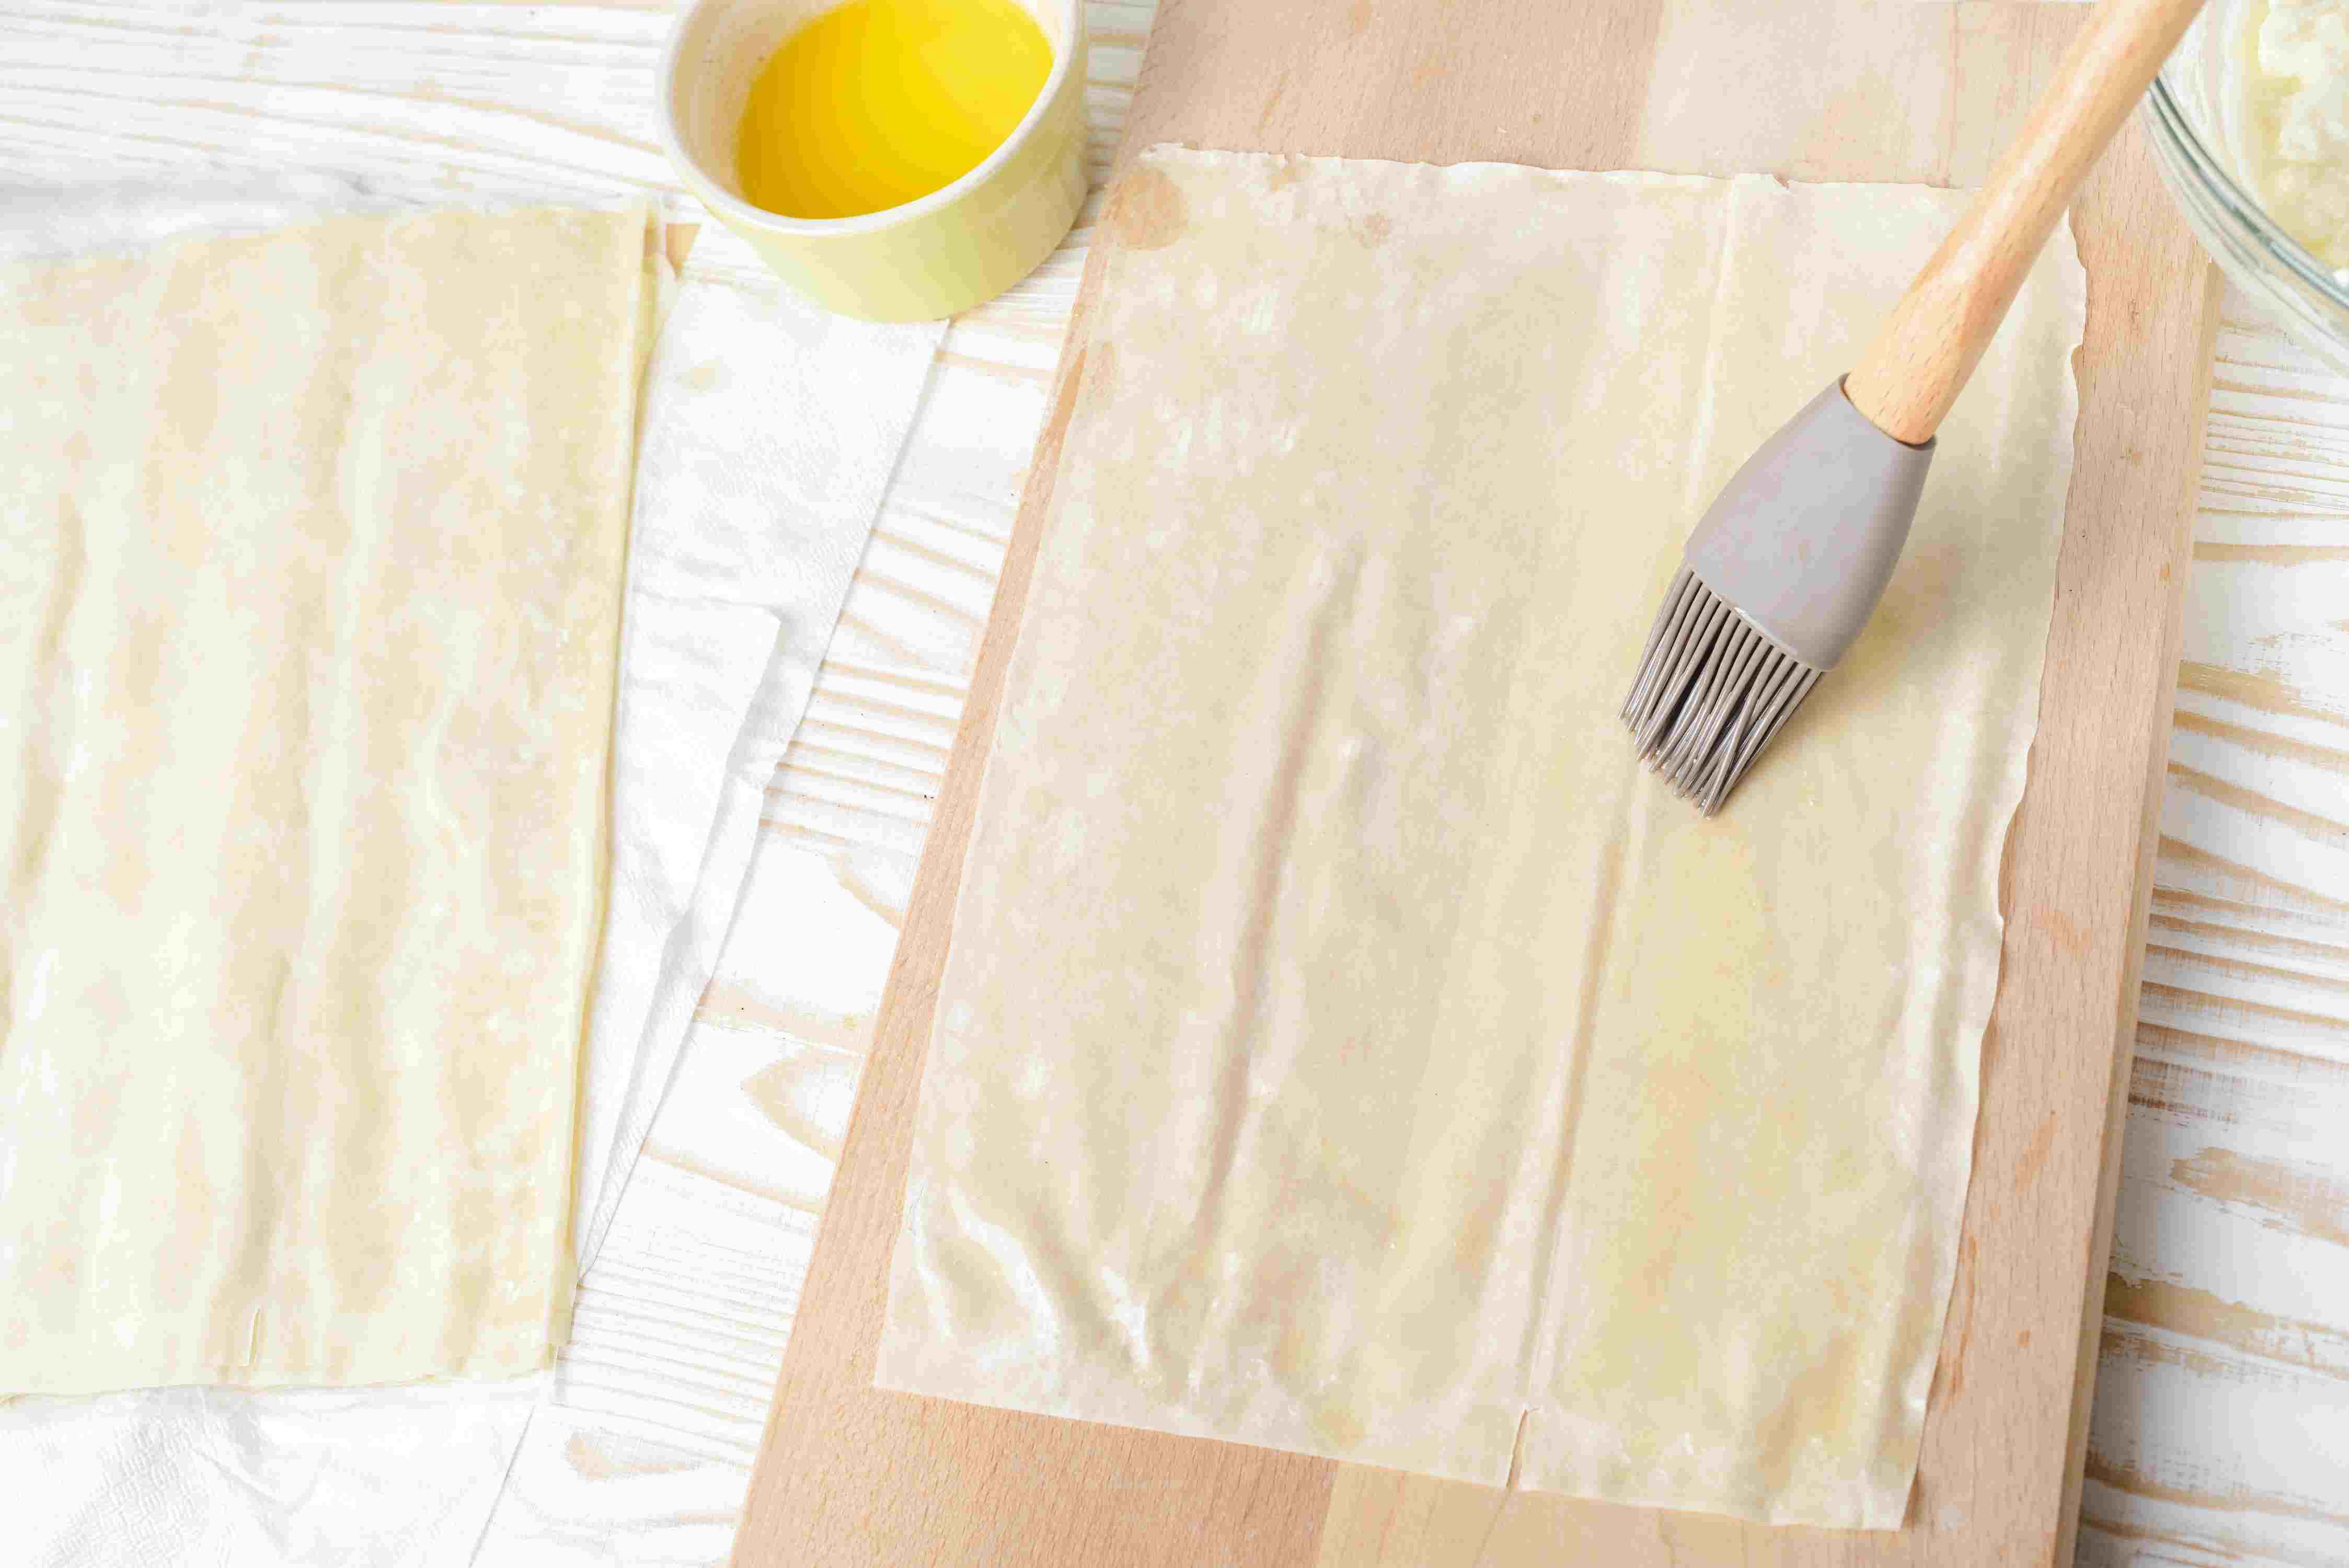 Remove sheet